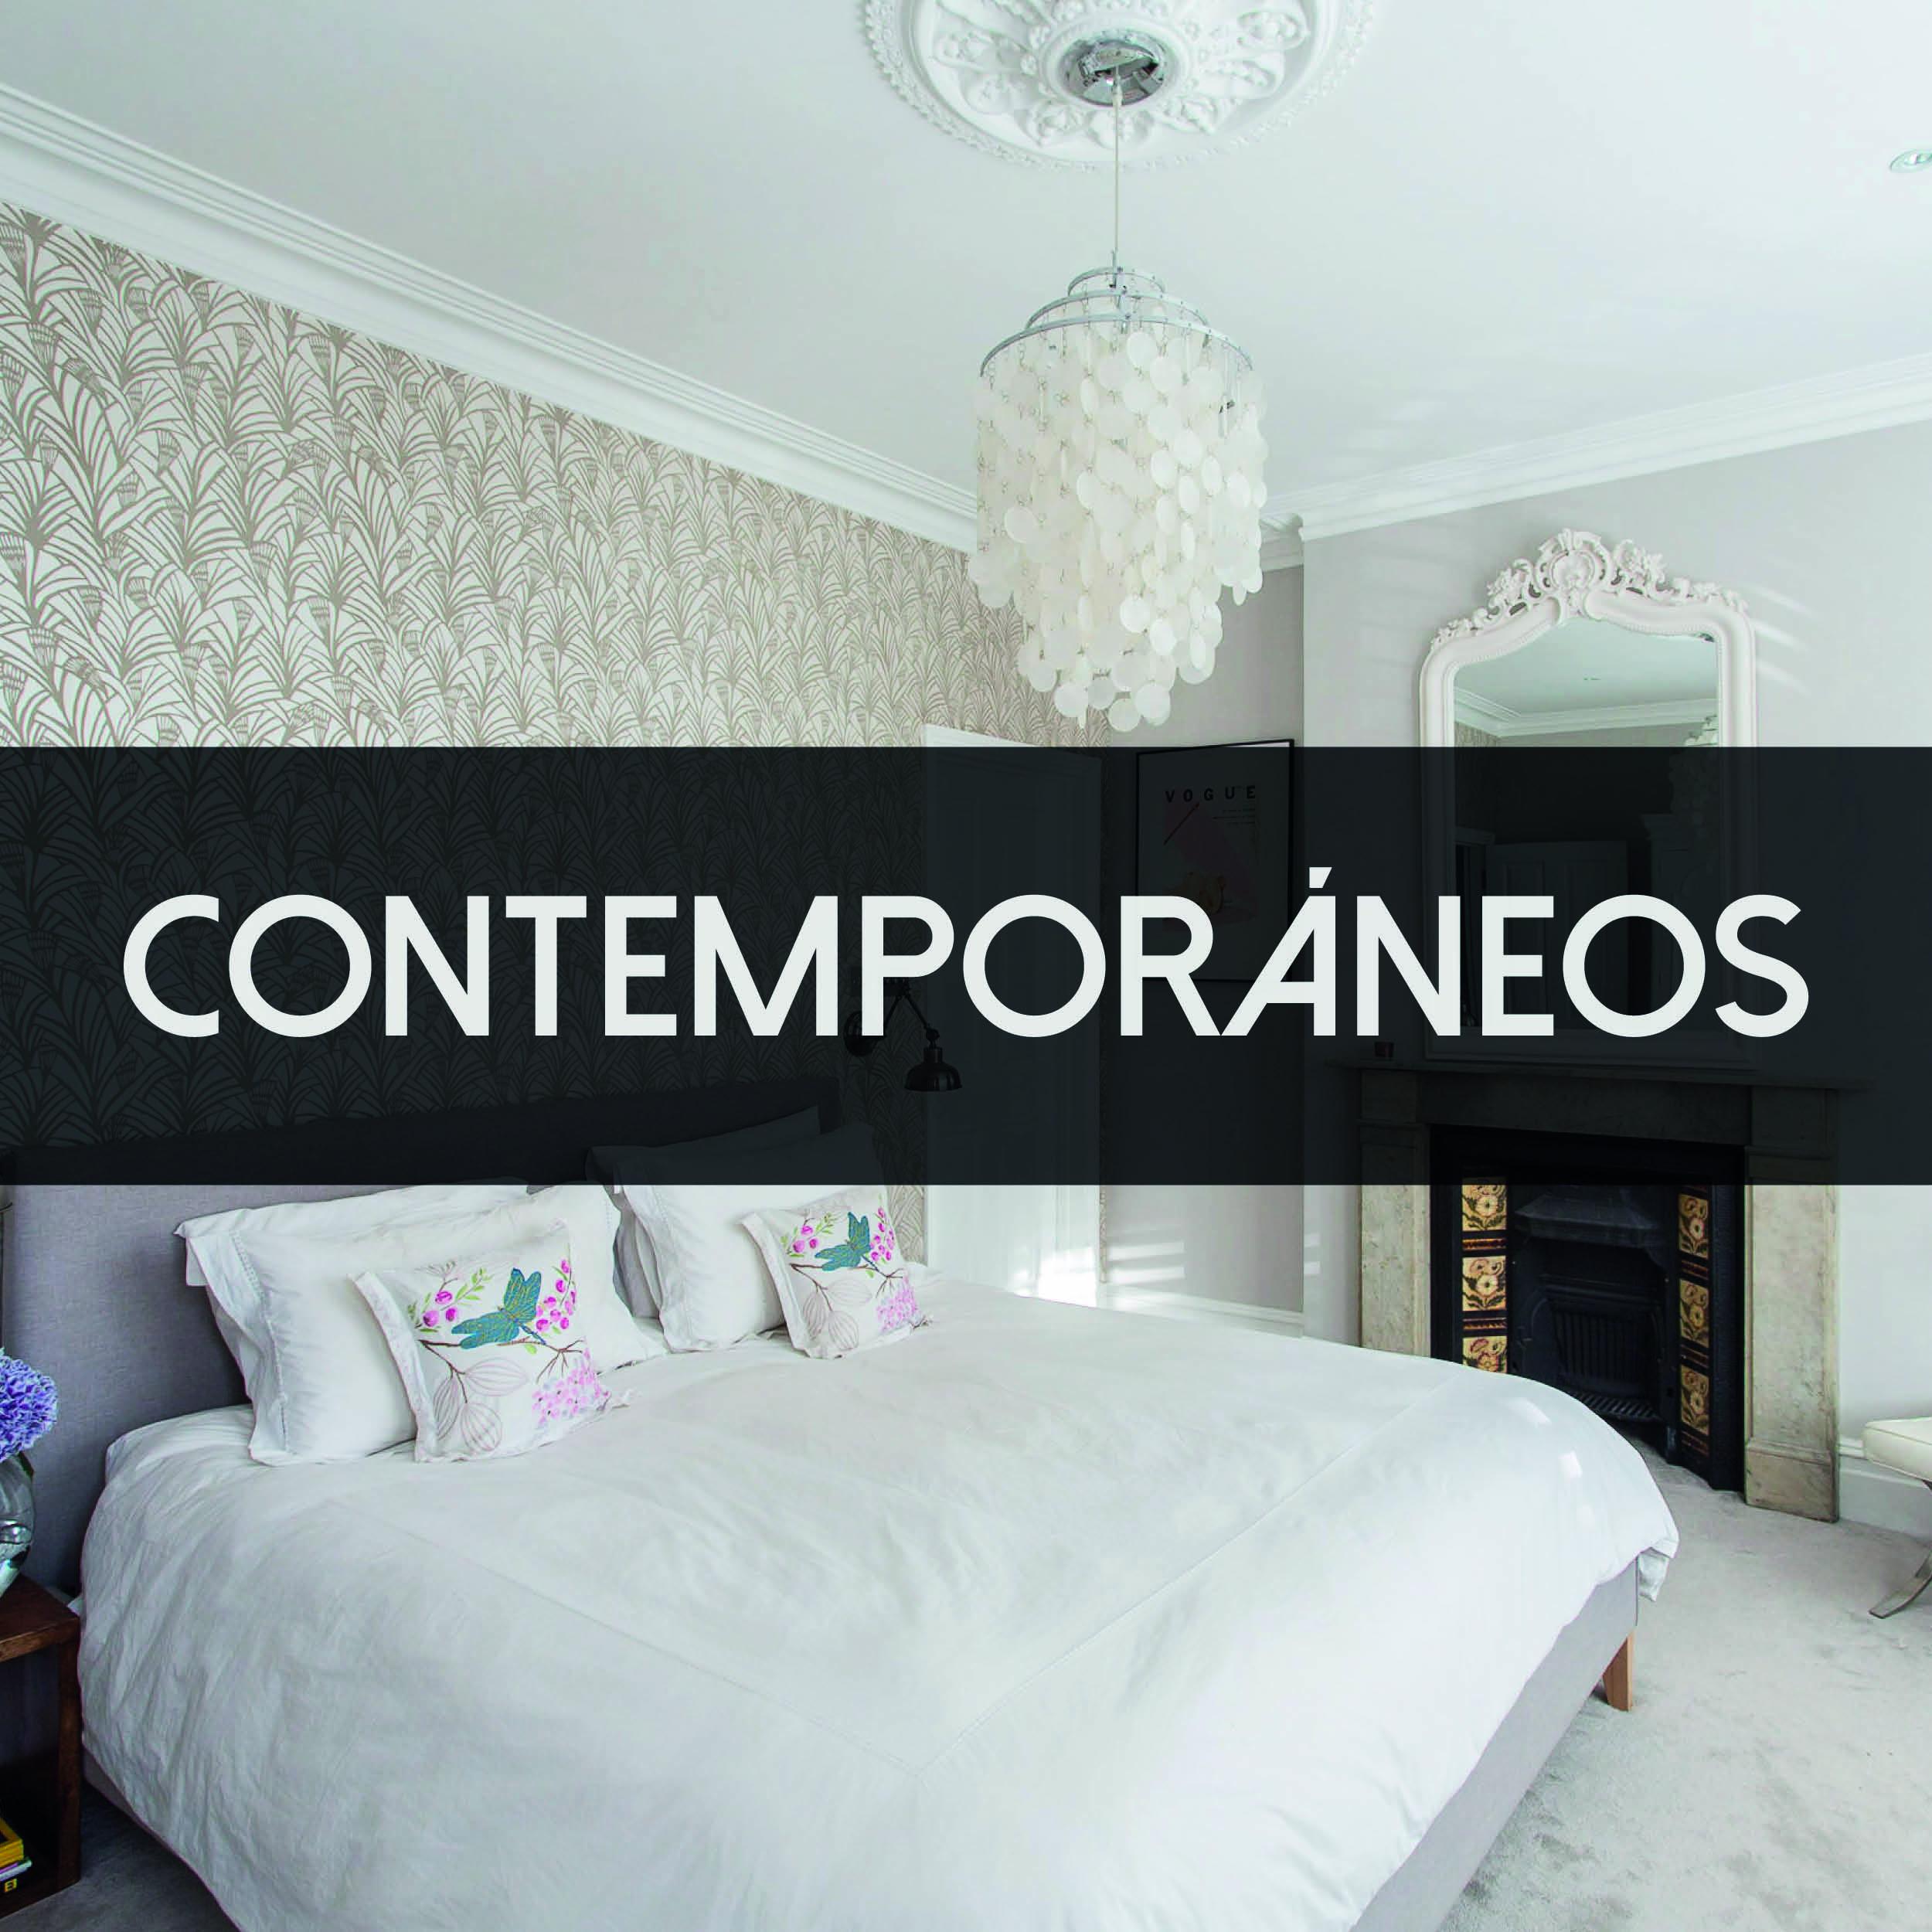 fotos de ideas de esquema de color de dormitorio Ideas Para Decorar Tu Dormitorio 77 Ideas Modernas Inolvidables